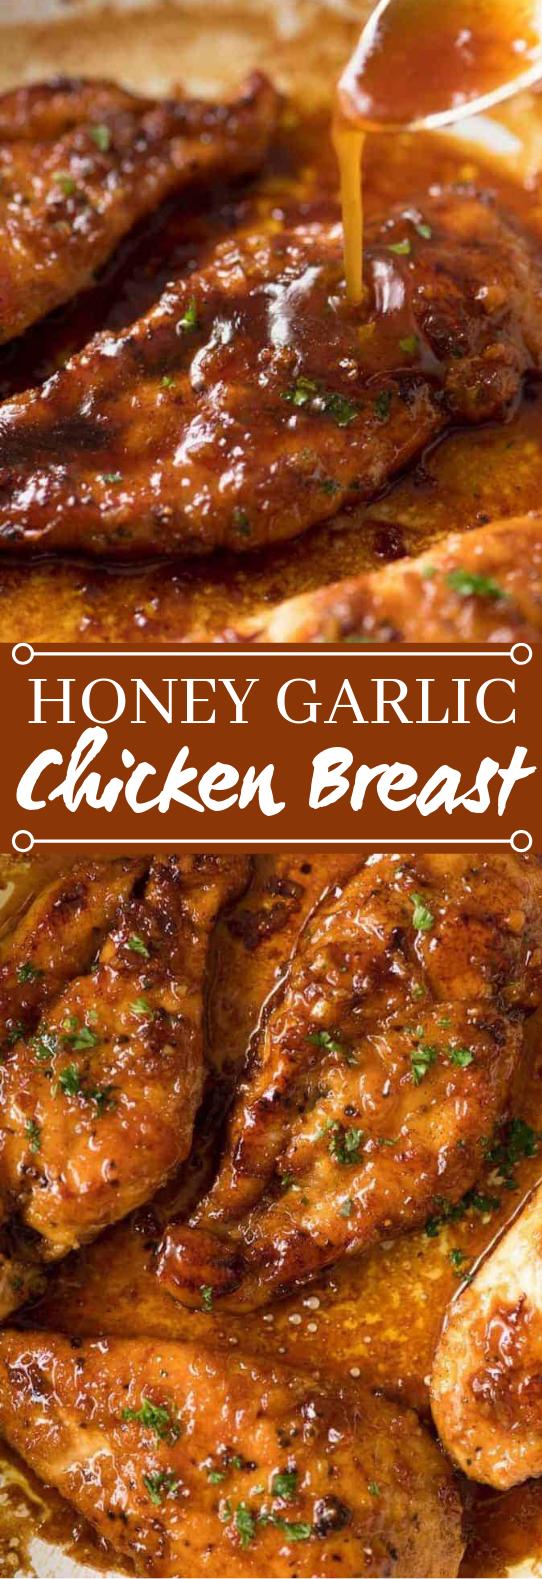 Honey Garlic Chicken Breast #dinner #chicken